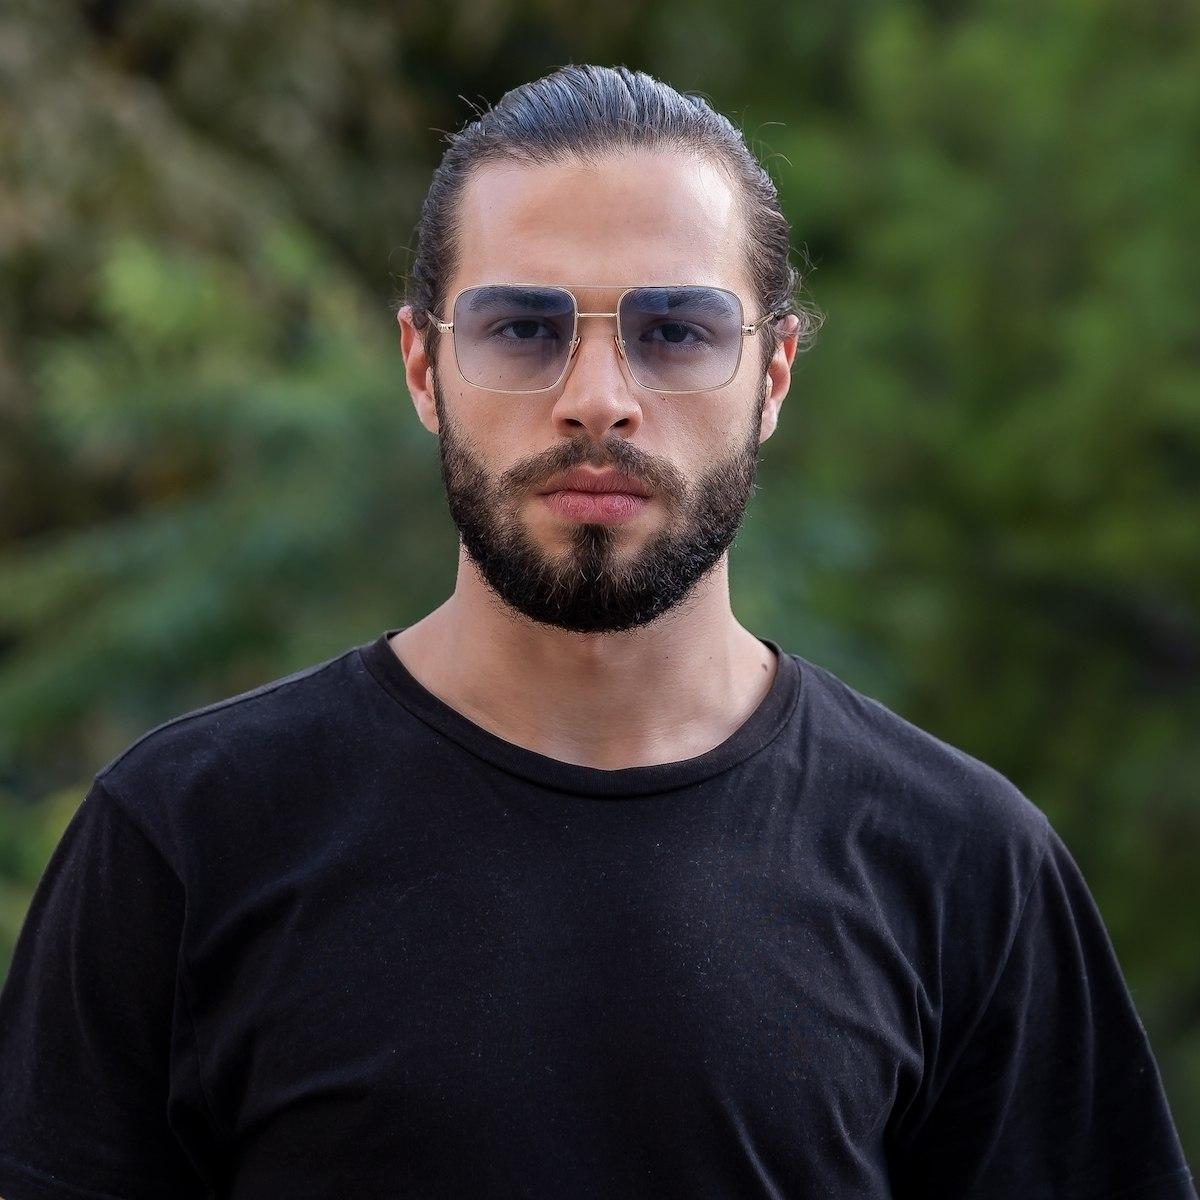 Men's Barett Black Shade Sunglasses